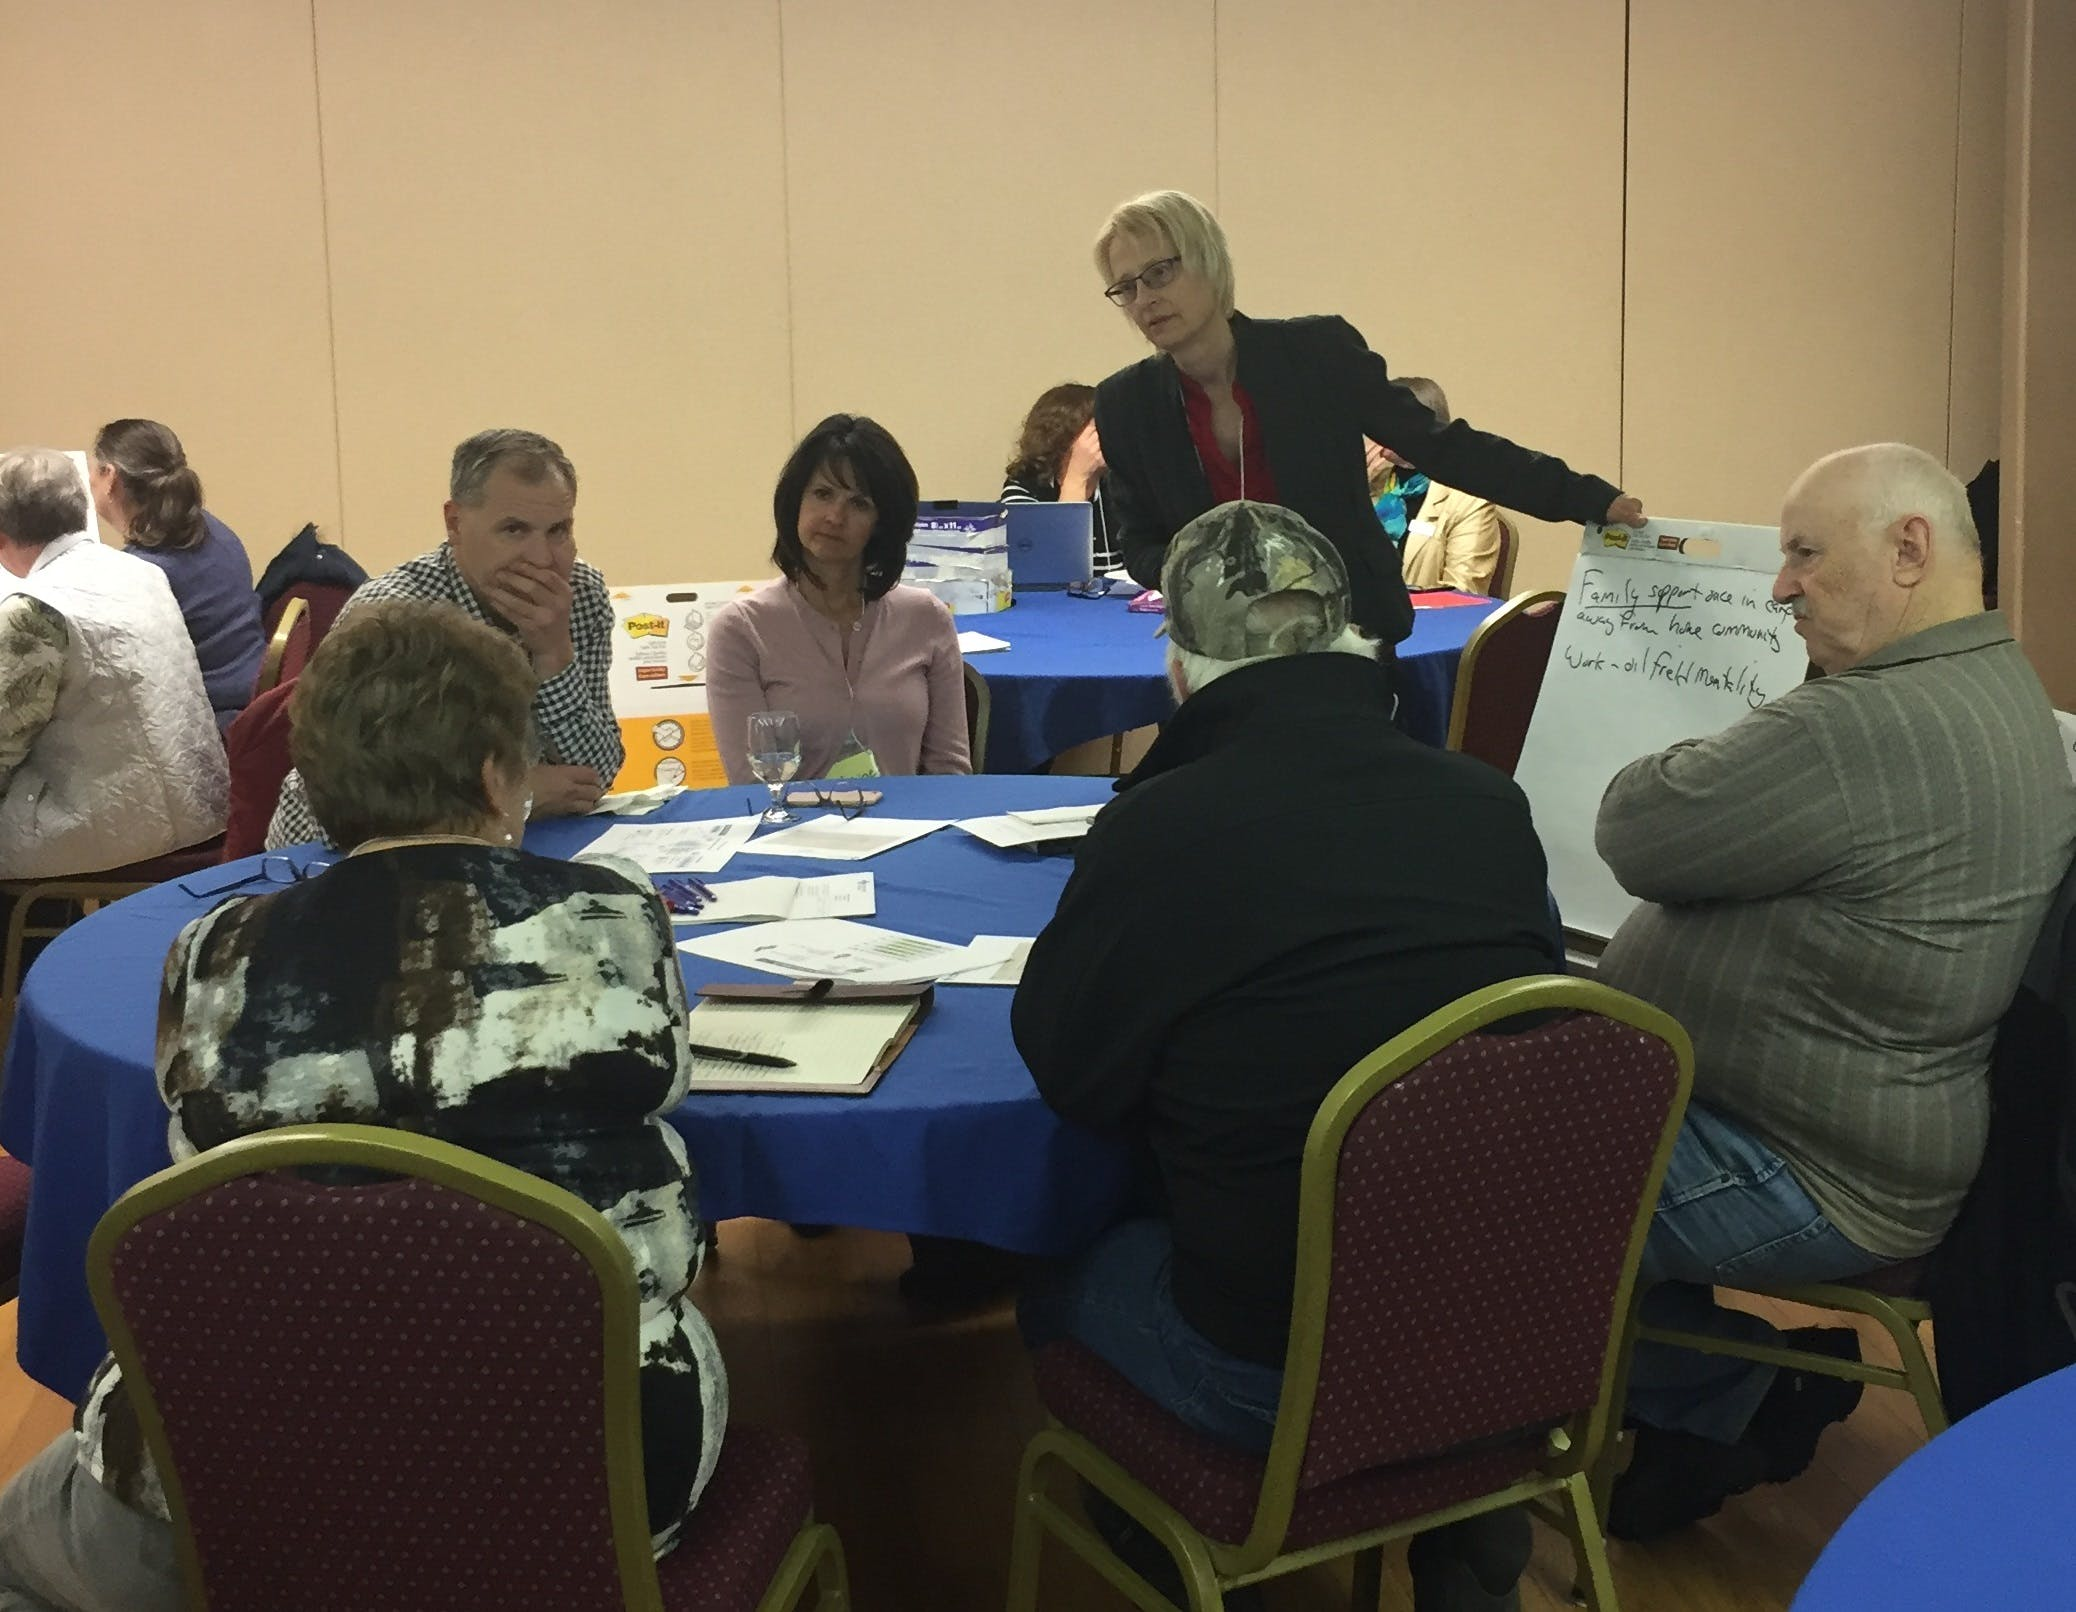 March 11 High Prairie Community Conversation